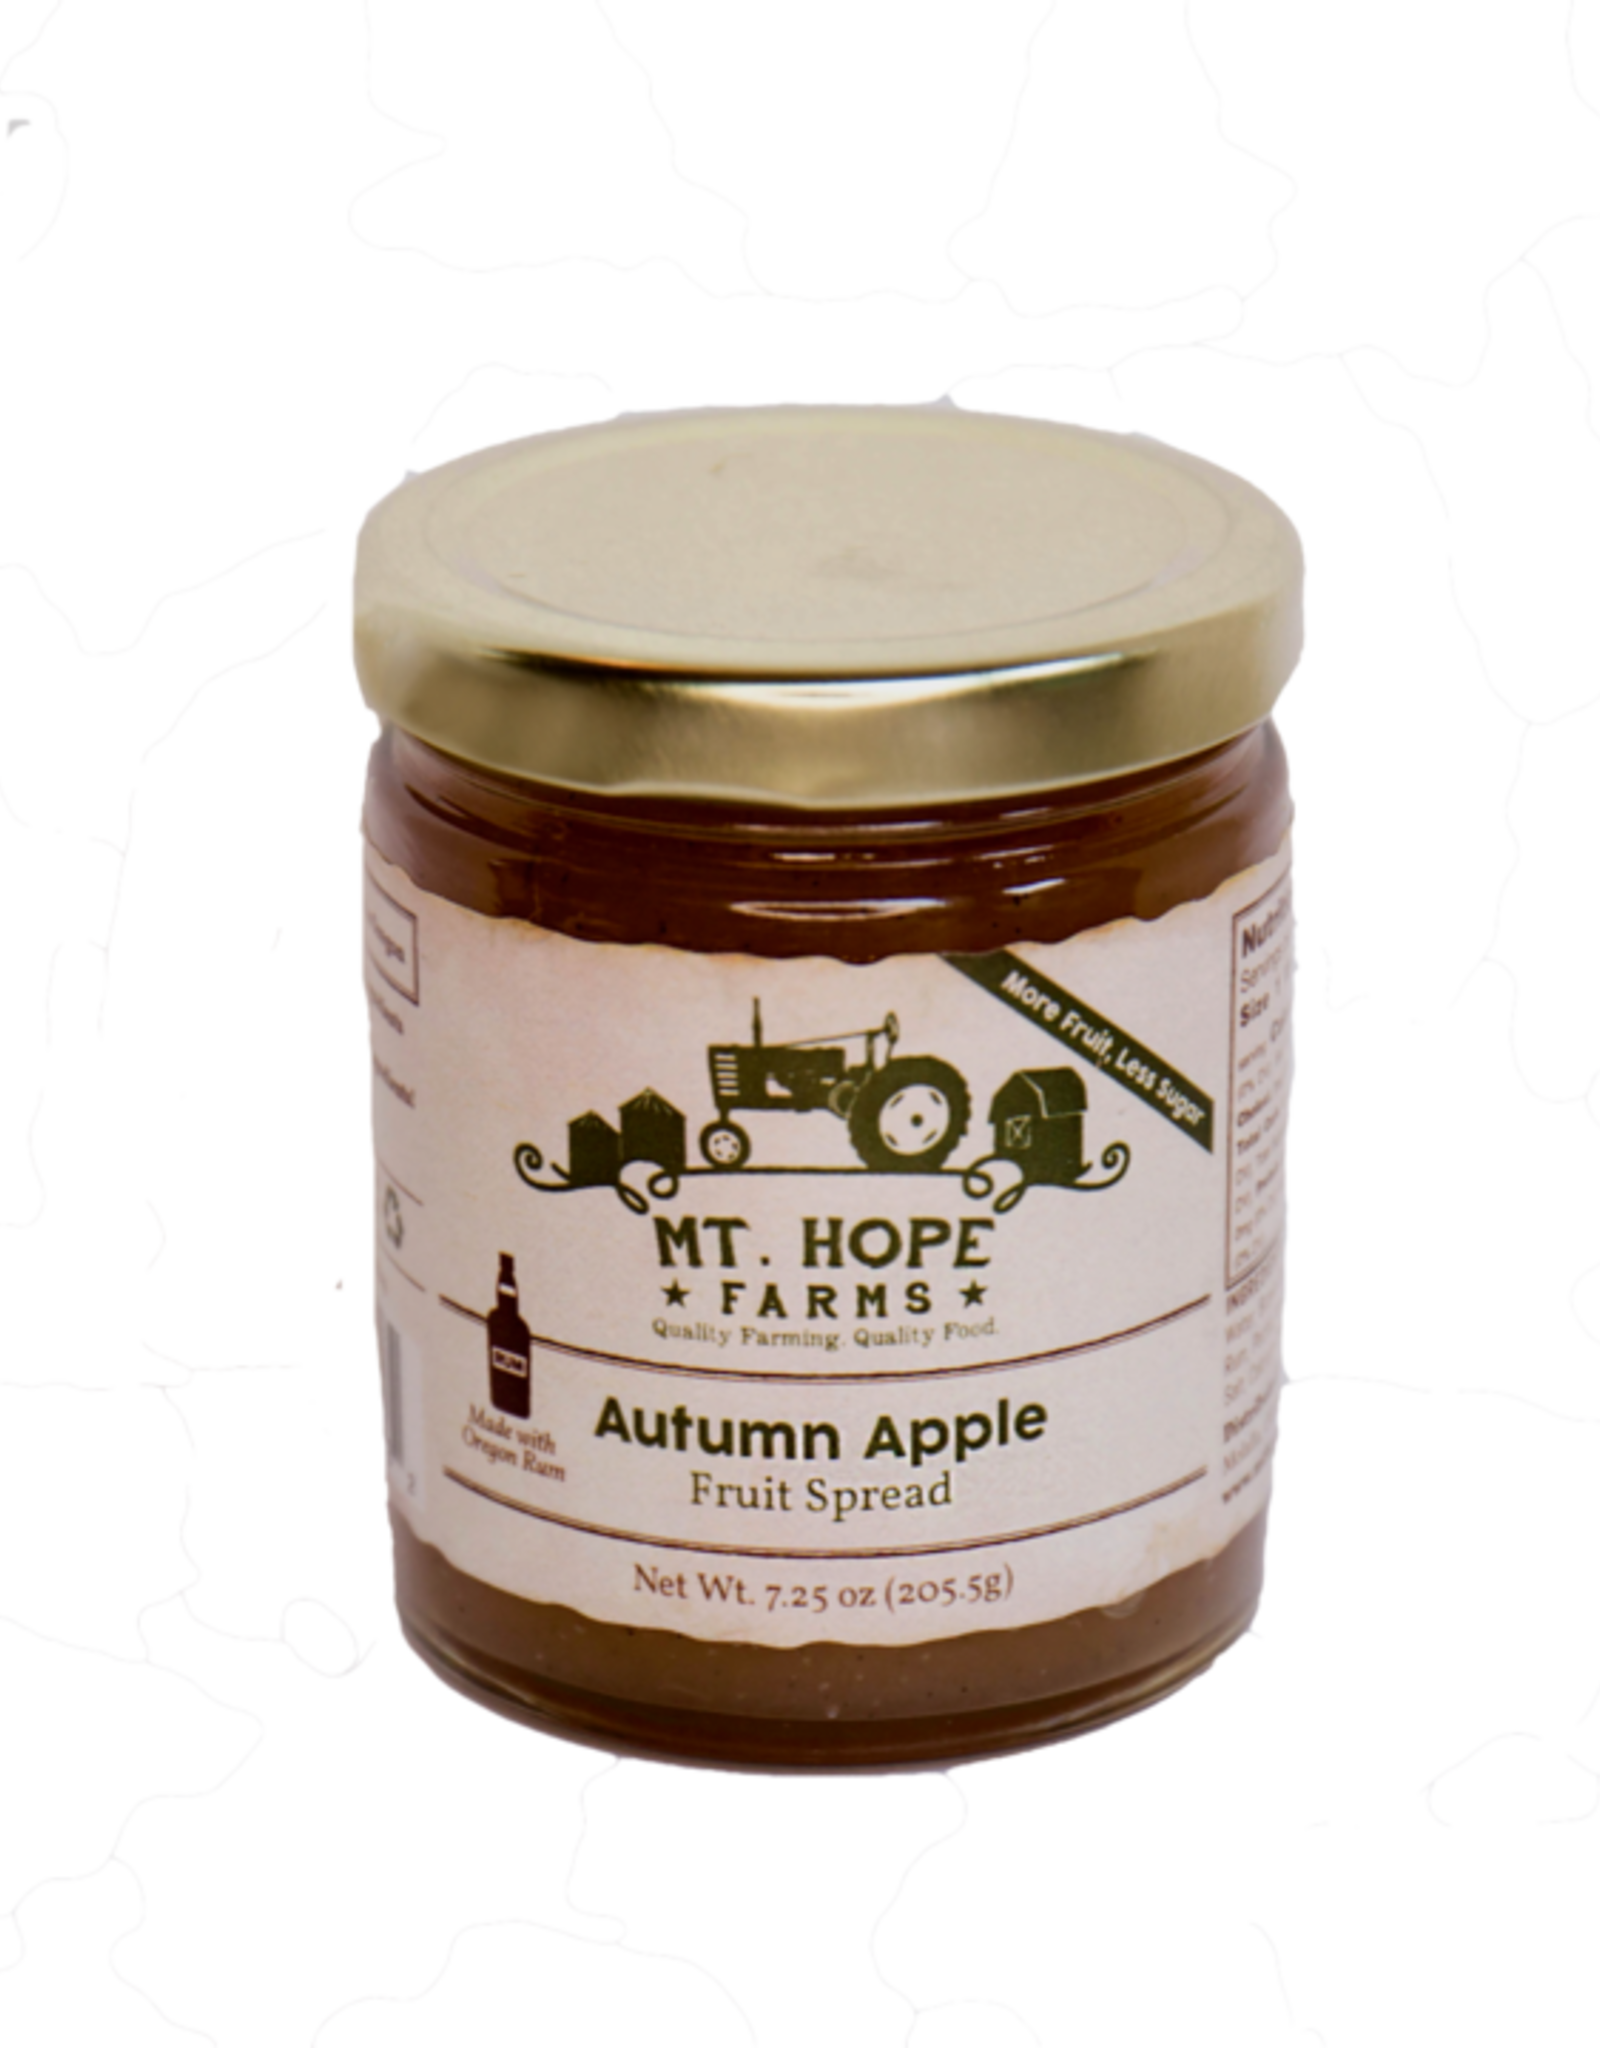 Autumn Apple Fruit Spread